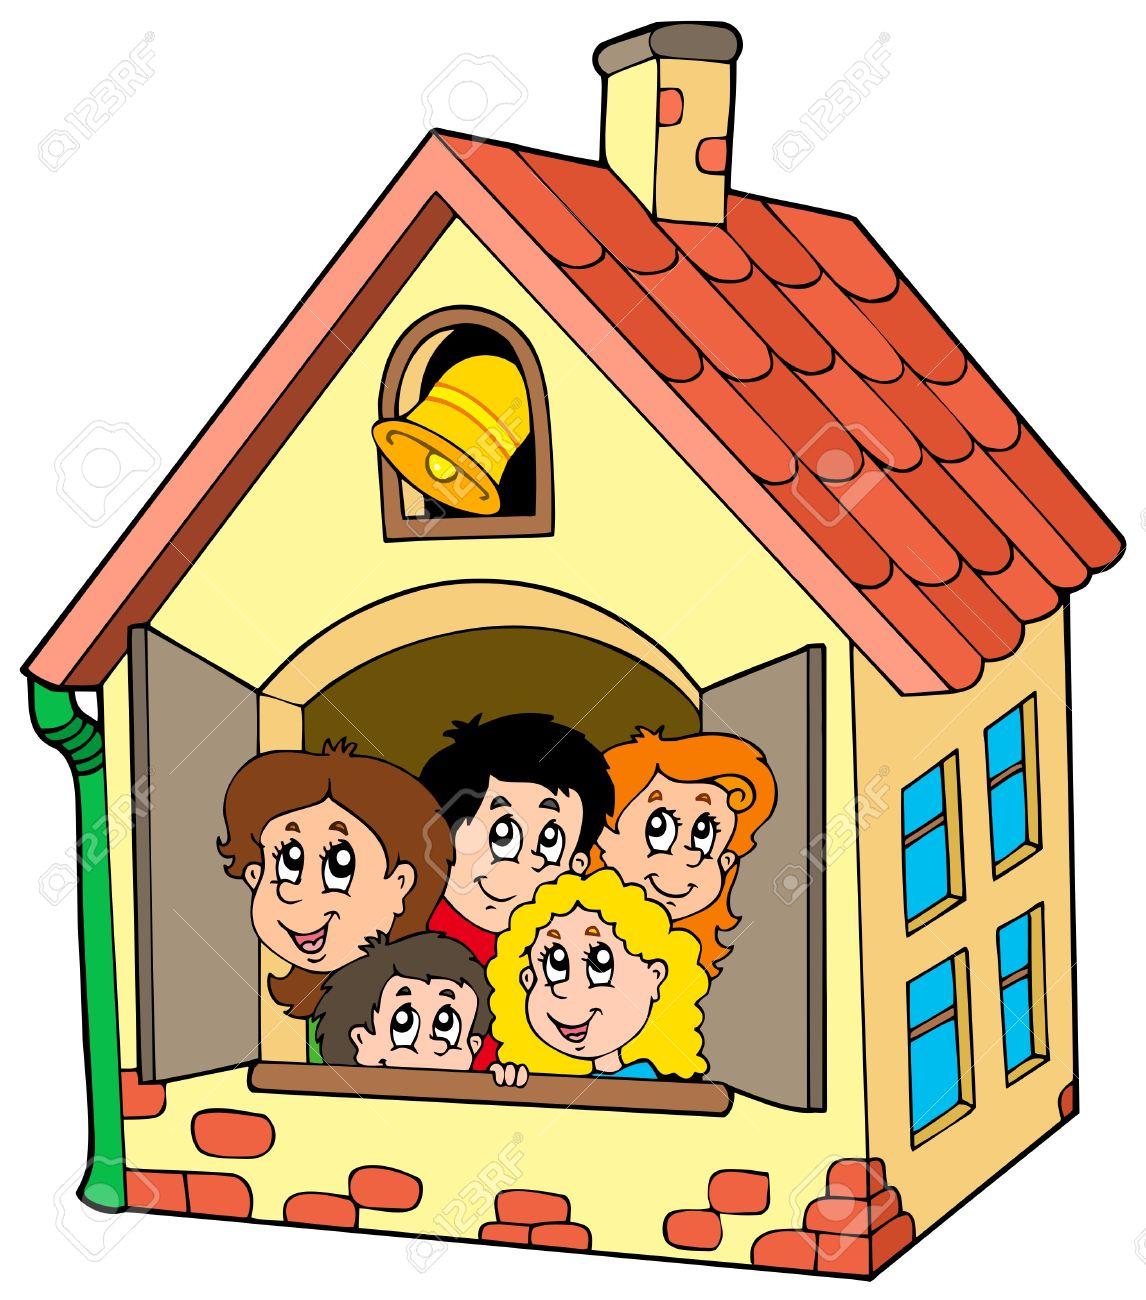 School House Cartoon Images School House Cartoon